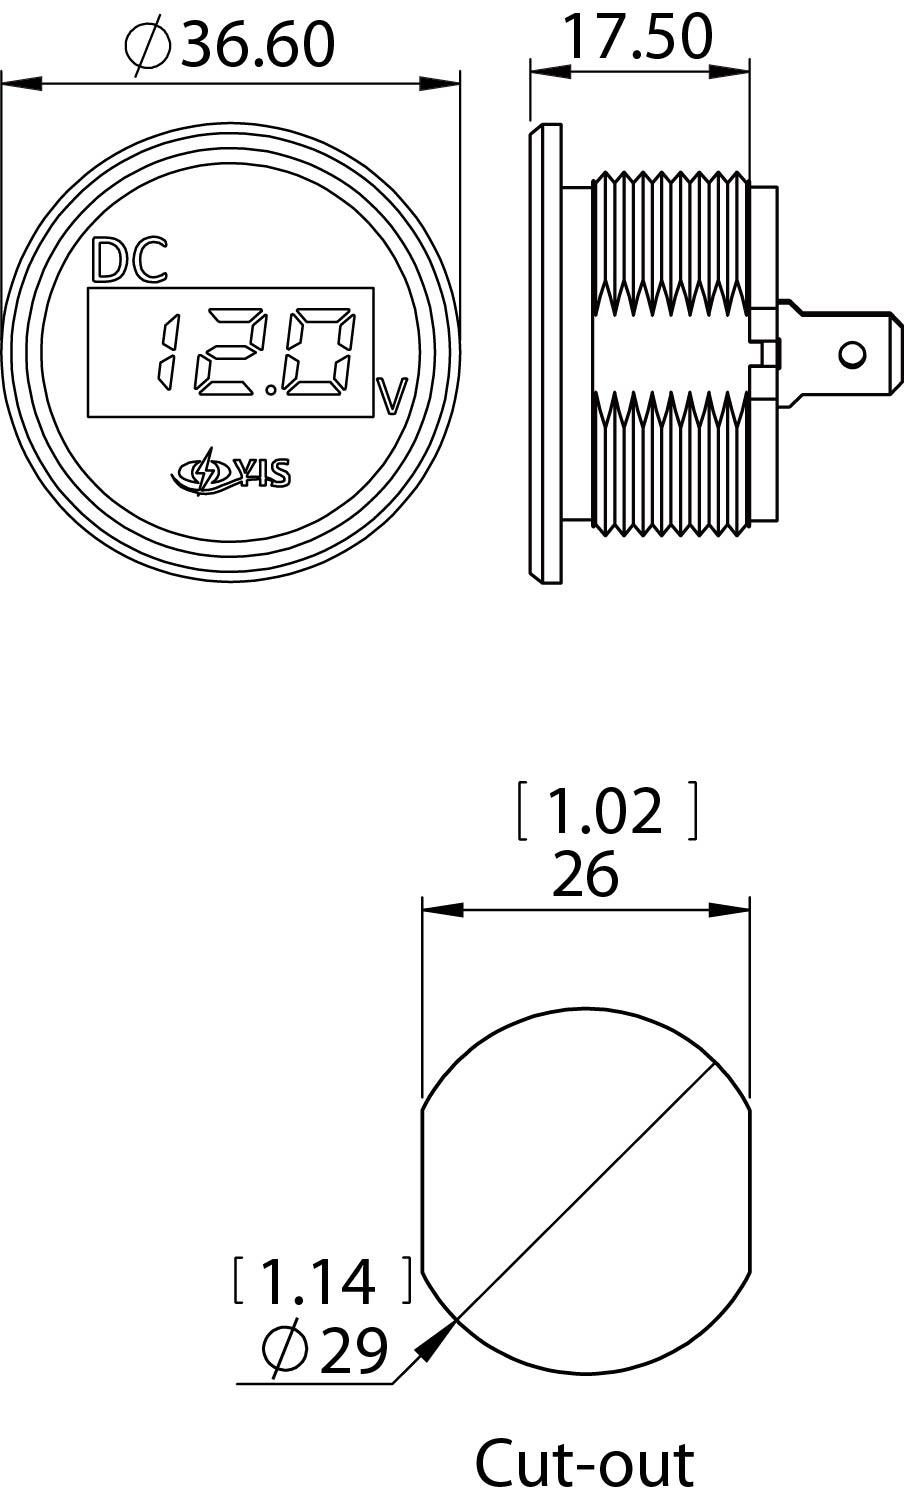 Keystone Trailer Wiring Diagram besides 1245 Interruptor Disyuntor Carling Serie A Toggle Blanco 8a Ac Dc likewise Marine Fuse Block Wiring Diagram additionally Illuminated Round Rocker Switch Wiring Diagram besides Wiring Diagram 2 Pole Contactor. on marine toggle switch panel